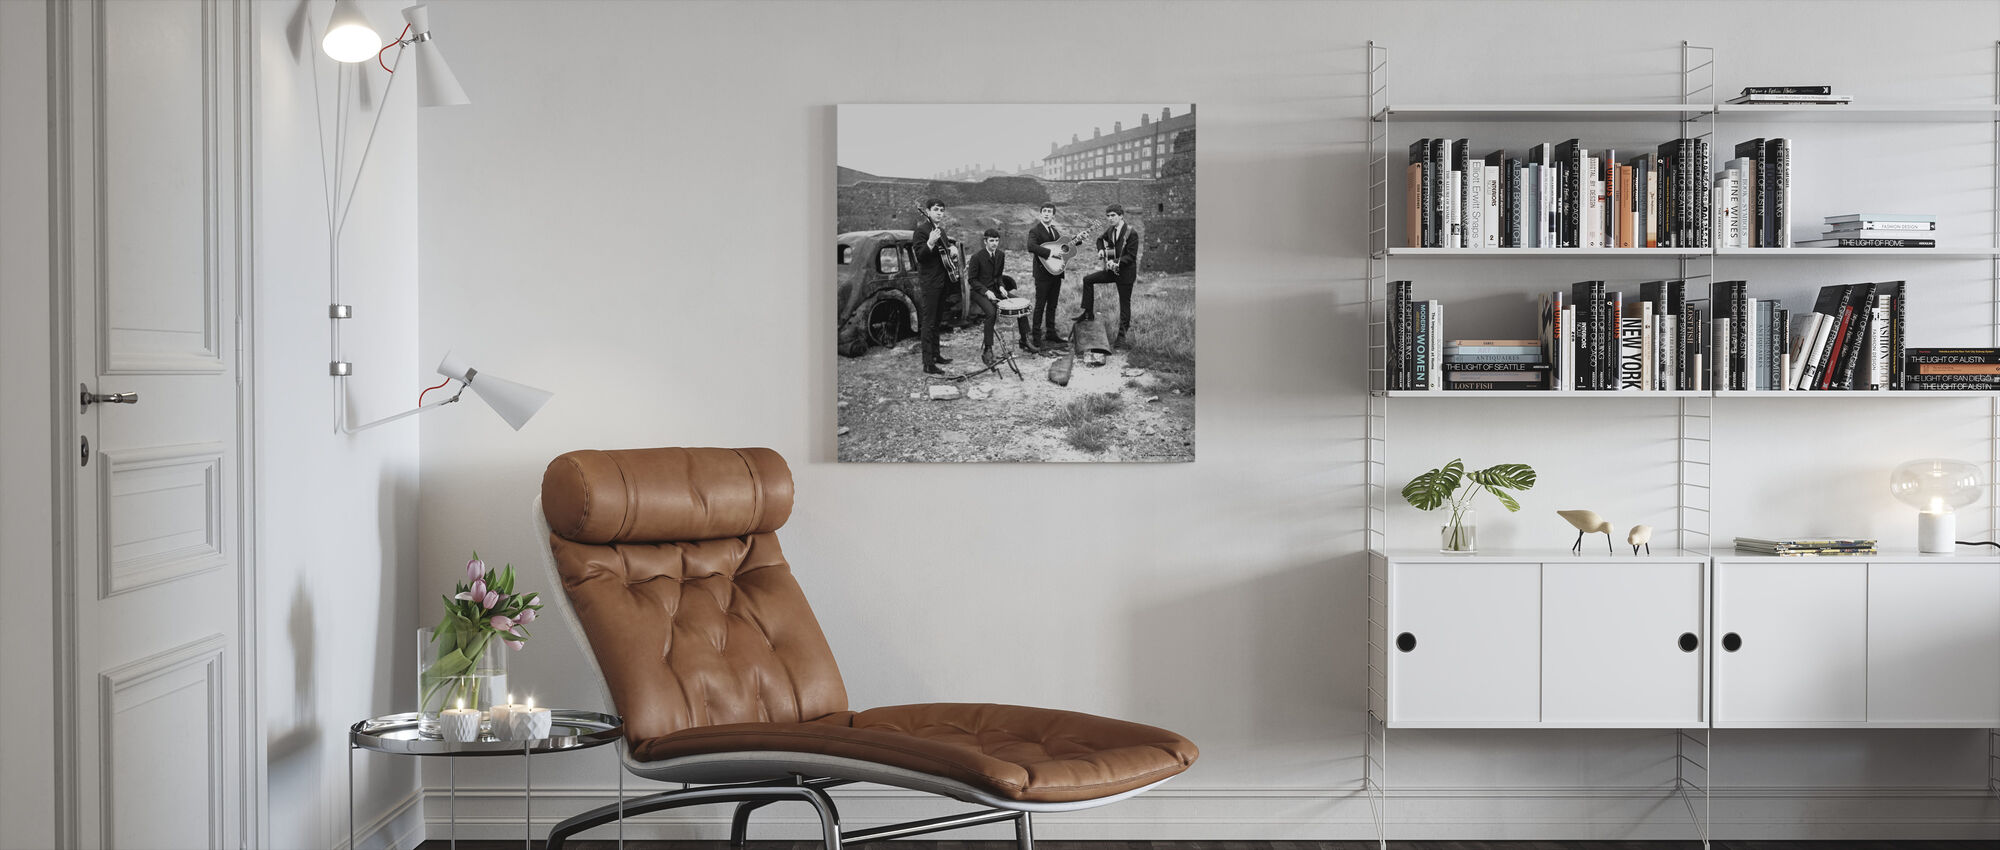 De Beatles - verlaten auto - Canvas print - Woonkamer